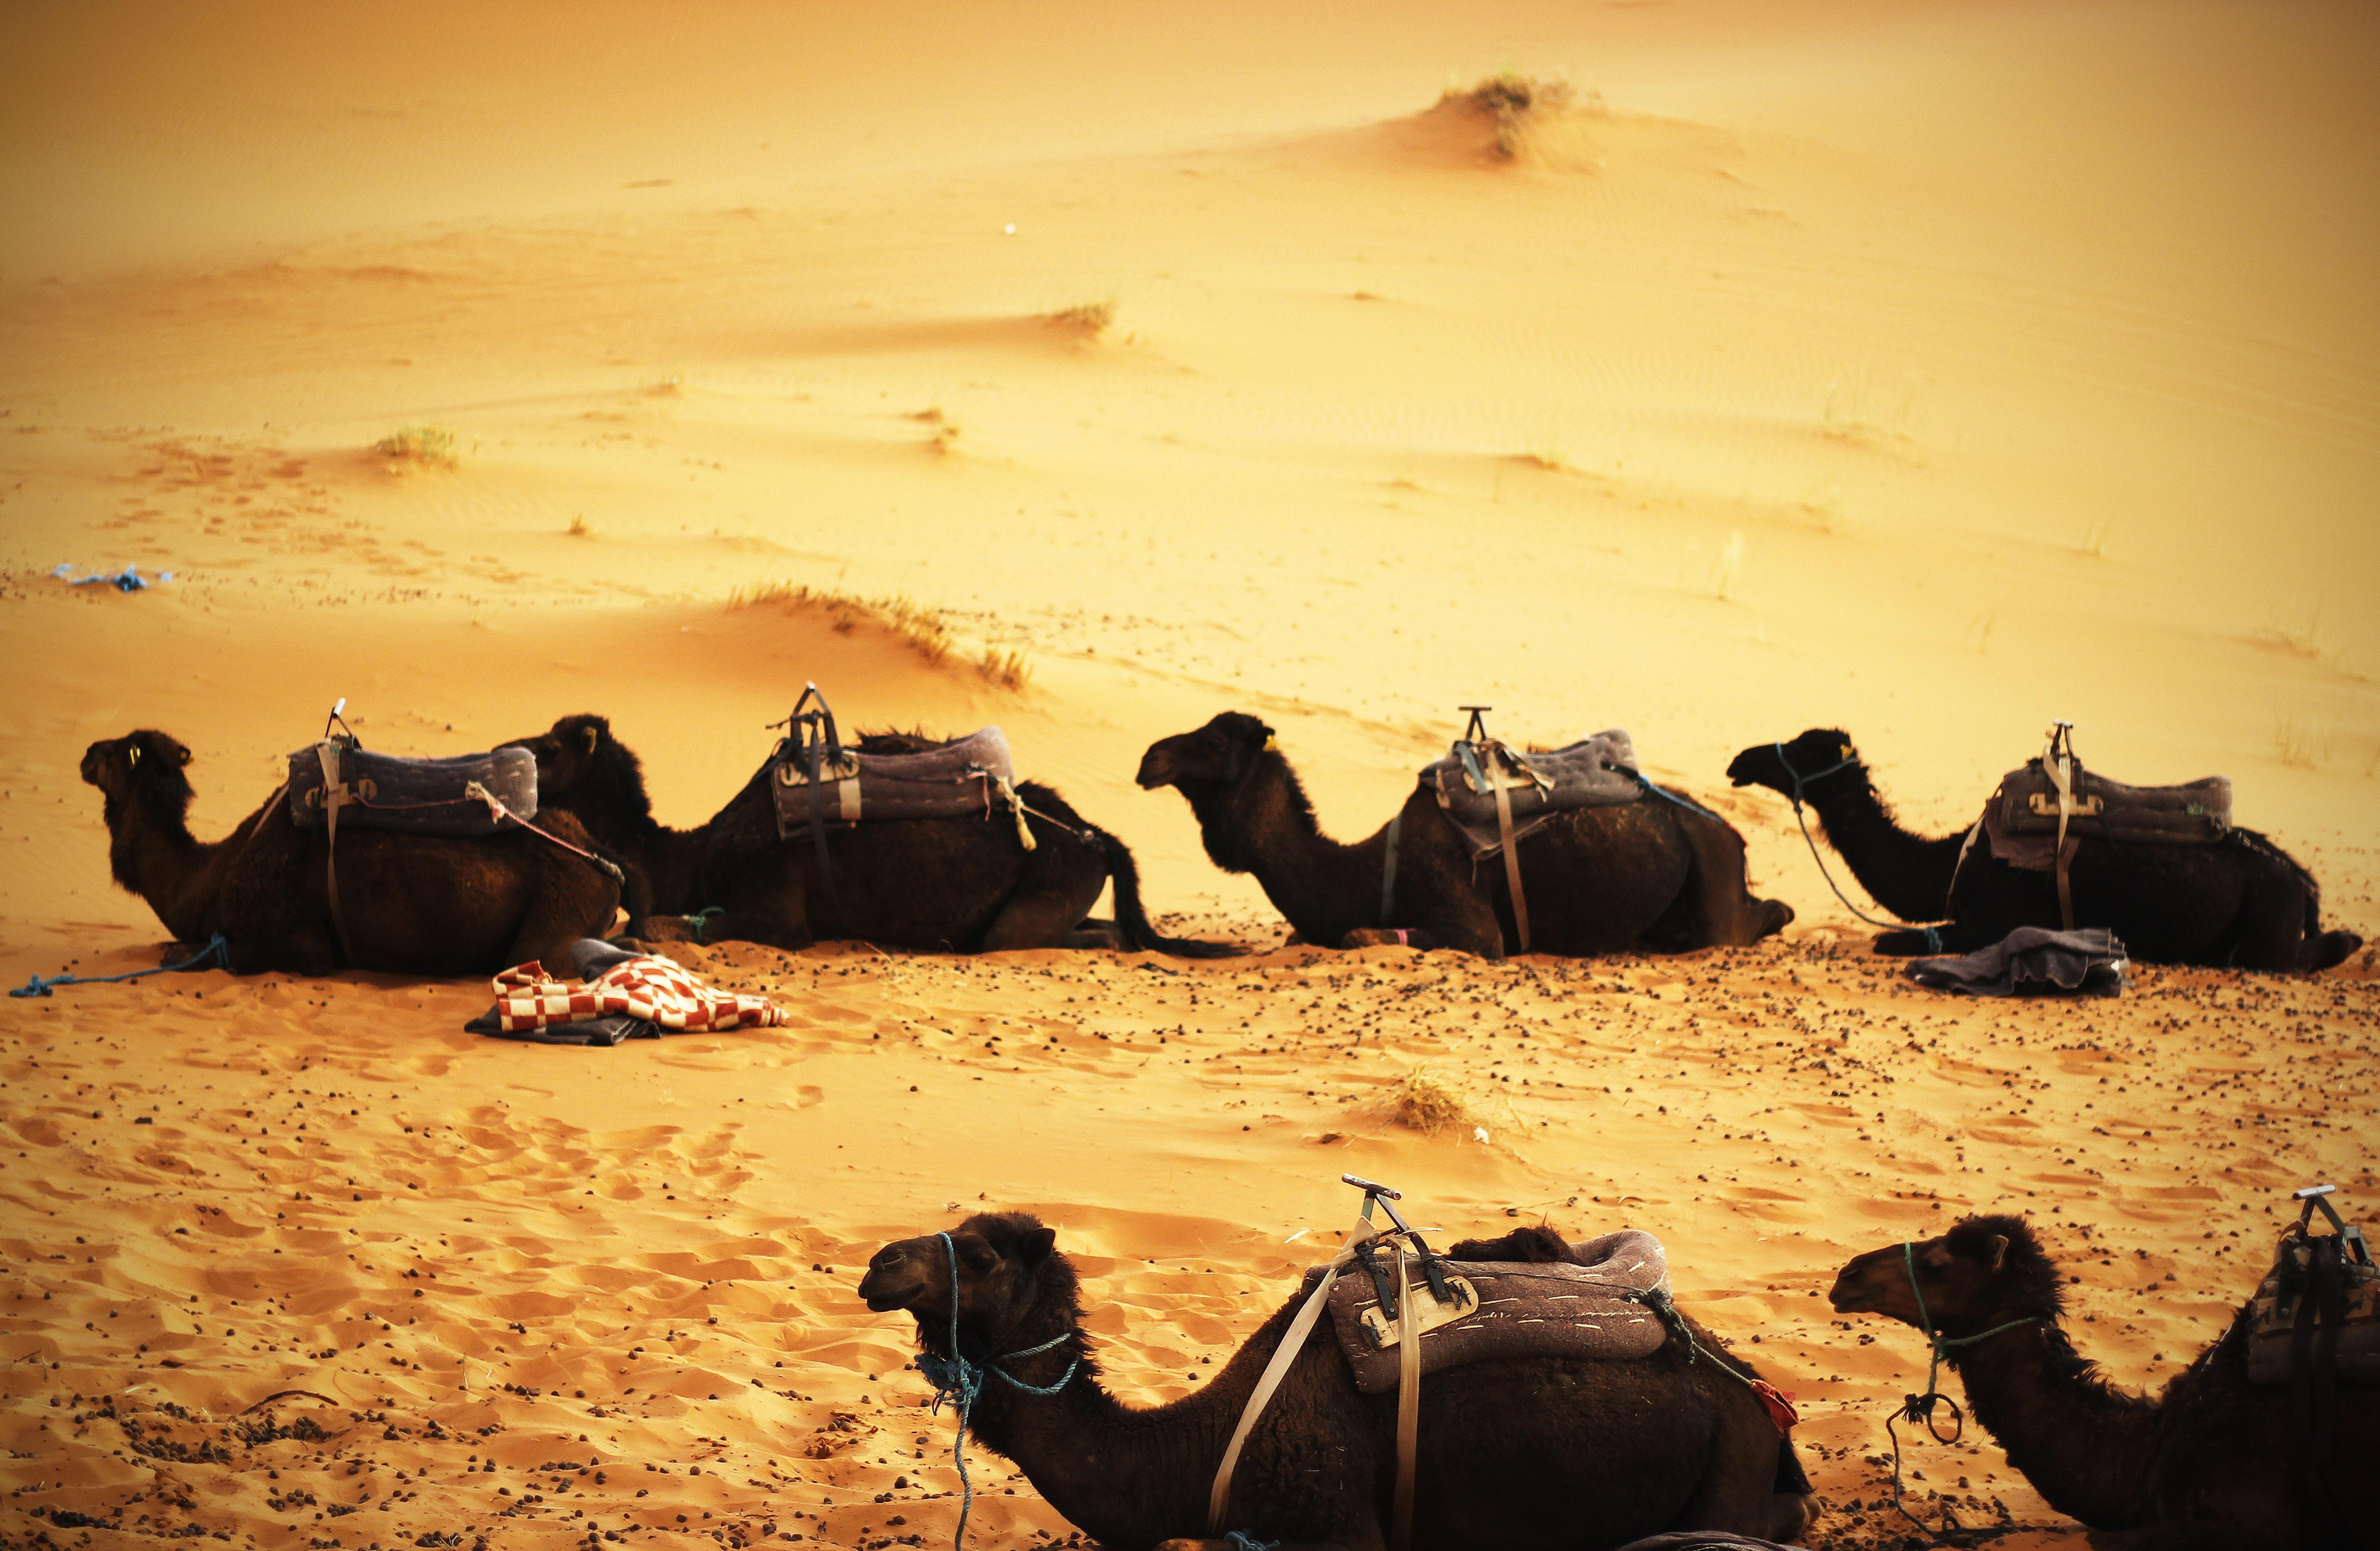 Camels take a break in the sandy desert